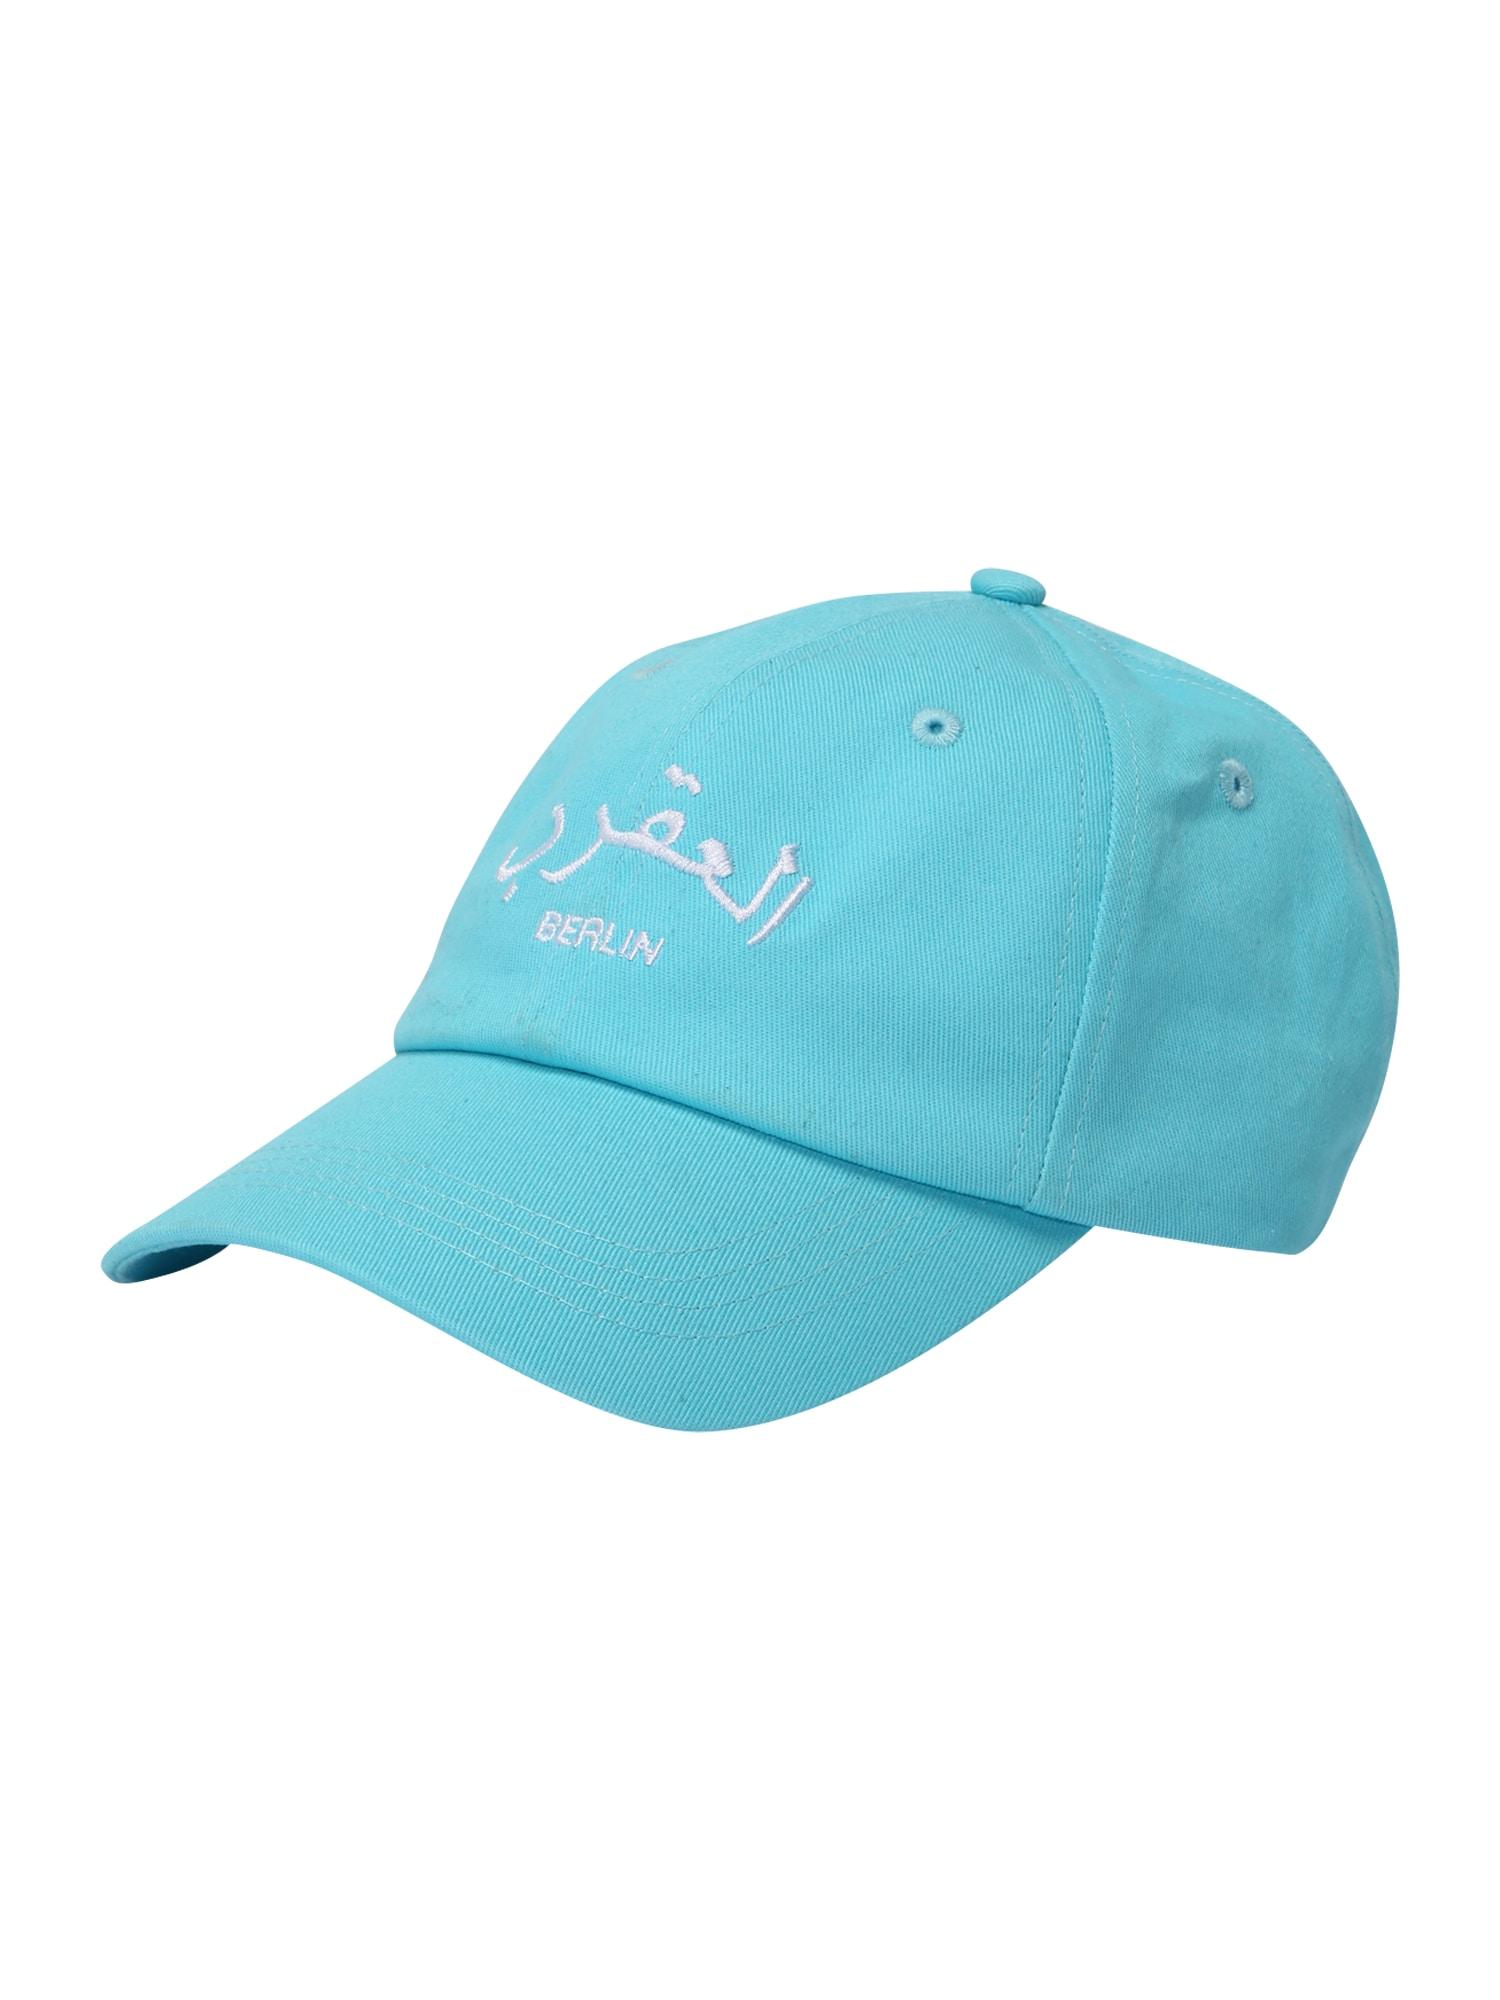 VIERVIER Kepurė